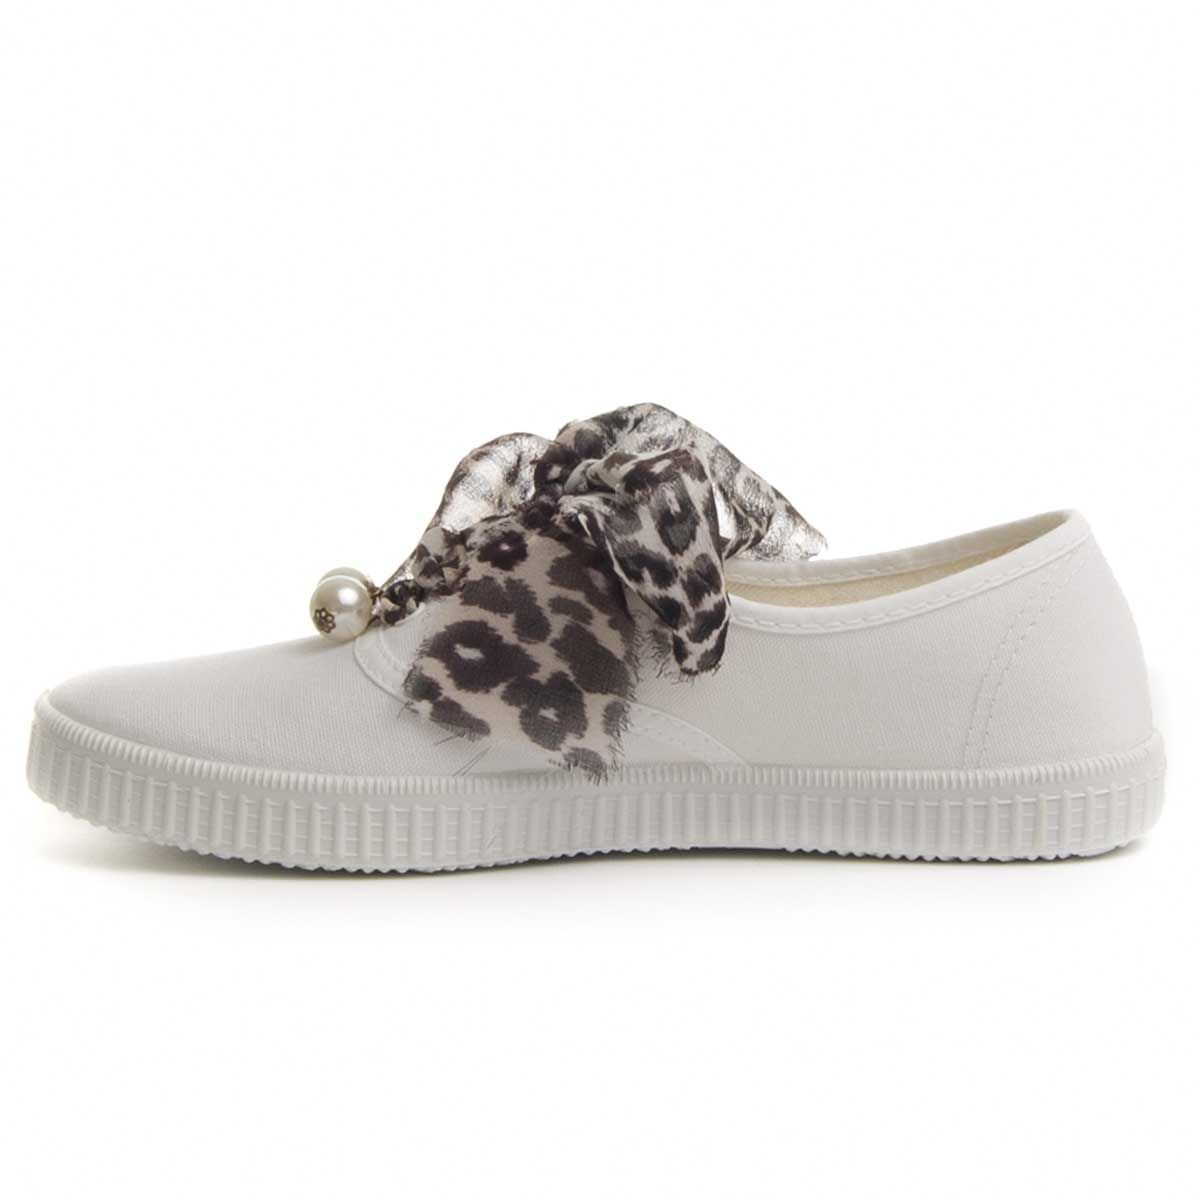 Maria Graor Ribbon Lace Sneaker in White